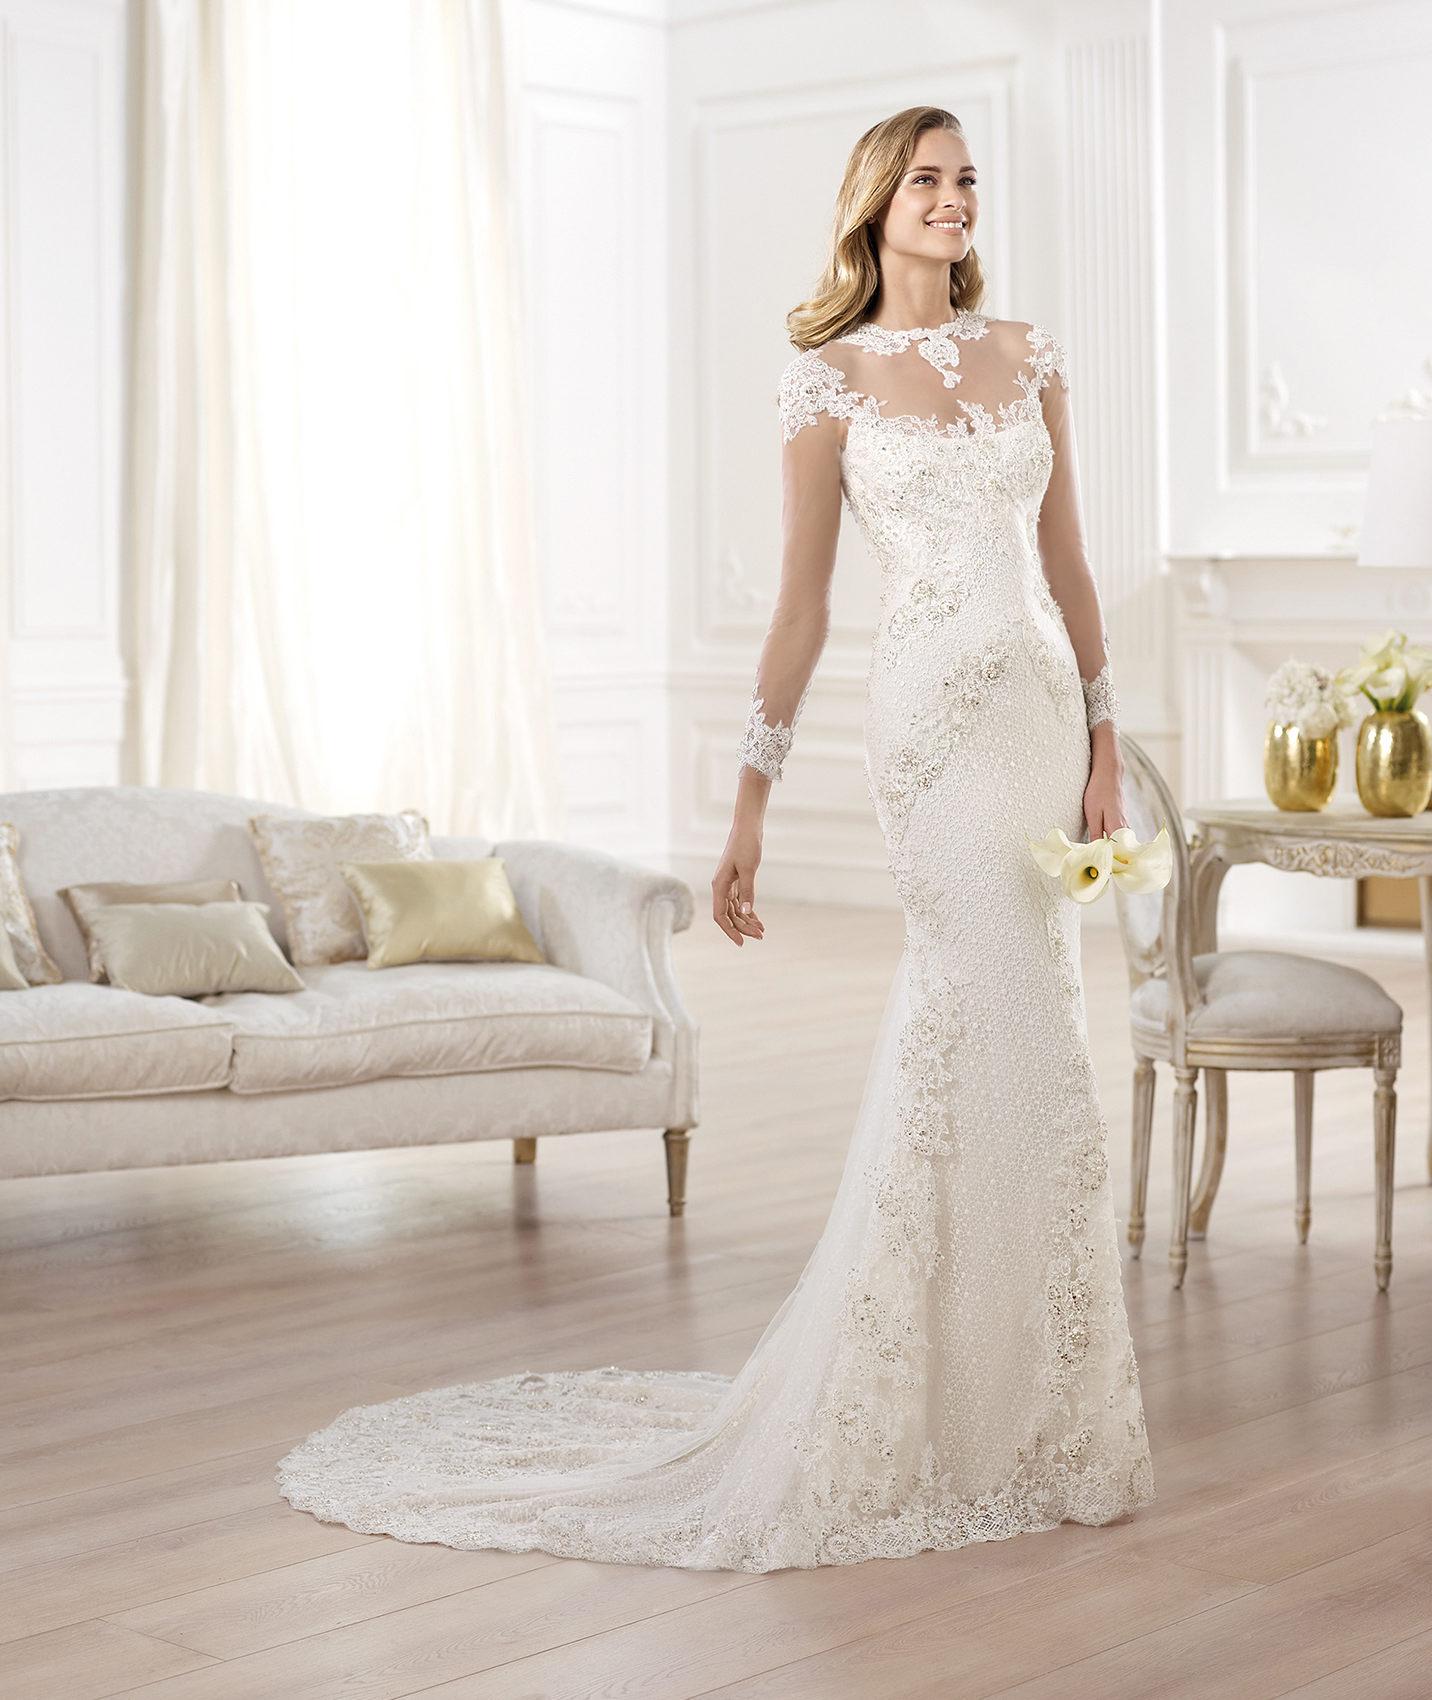 Wedding Gowns 2014: YANIDA Wedding Dress By Atelier Pronovias 2014 Bridal 2